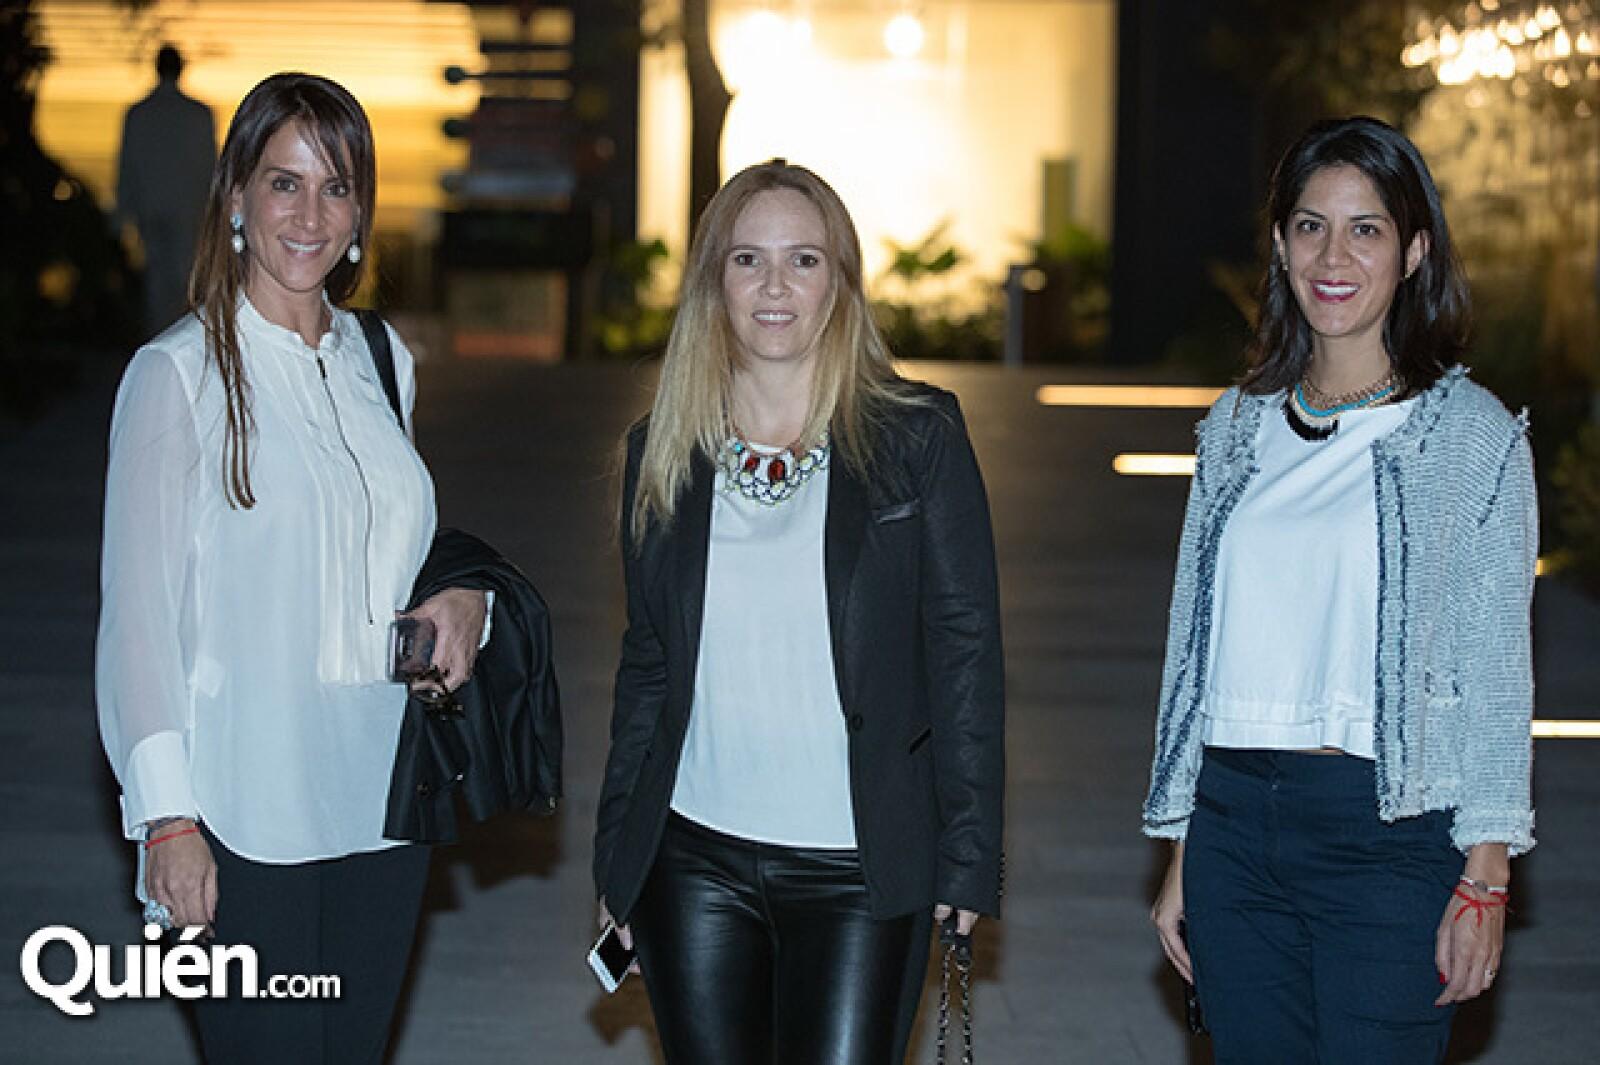 Verónica Salame, Galia Ziman y Stephanie Beckmann